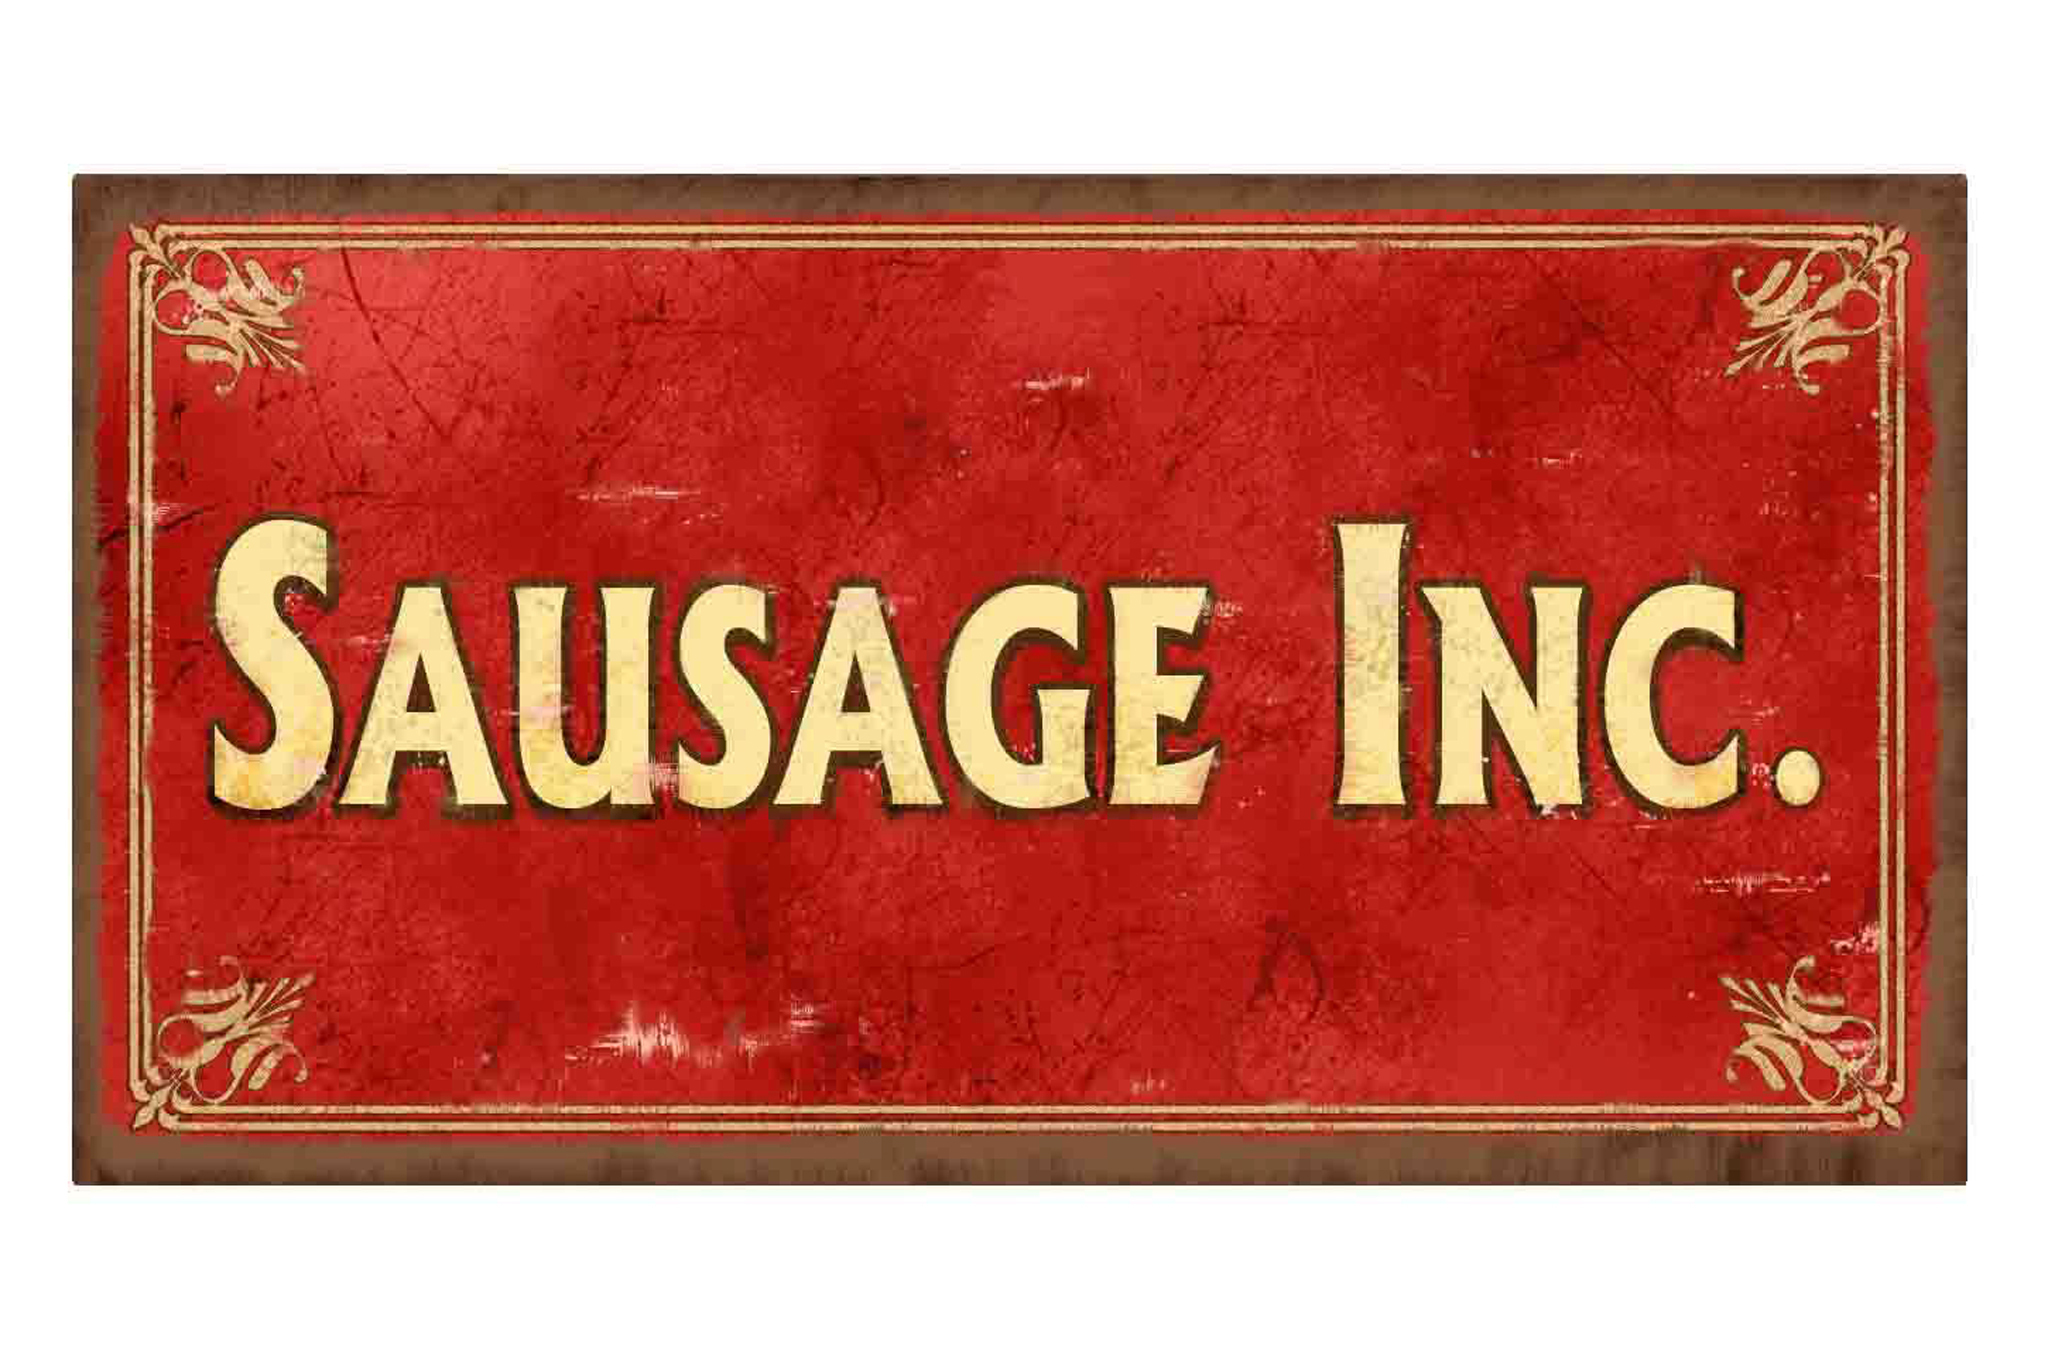 Sausage Inc.